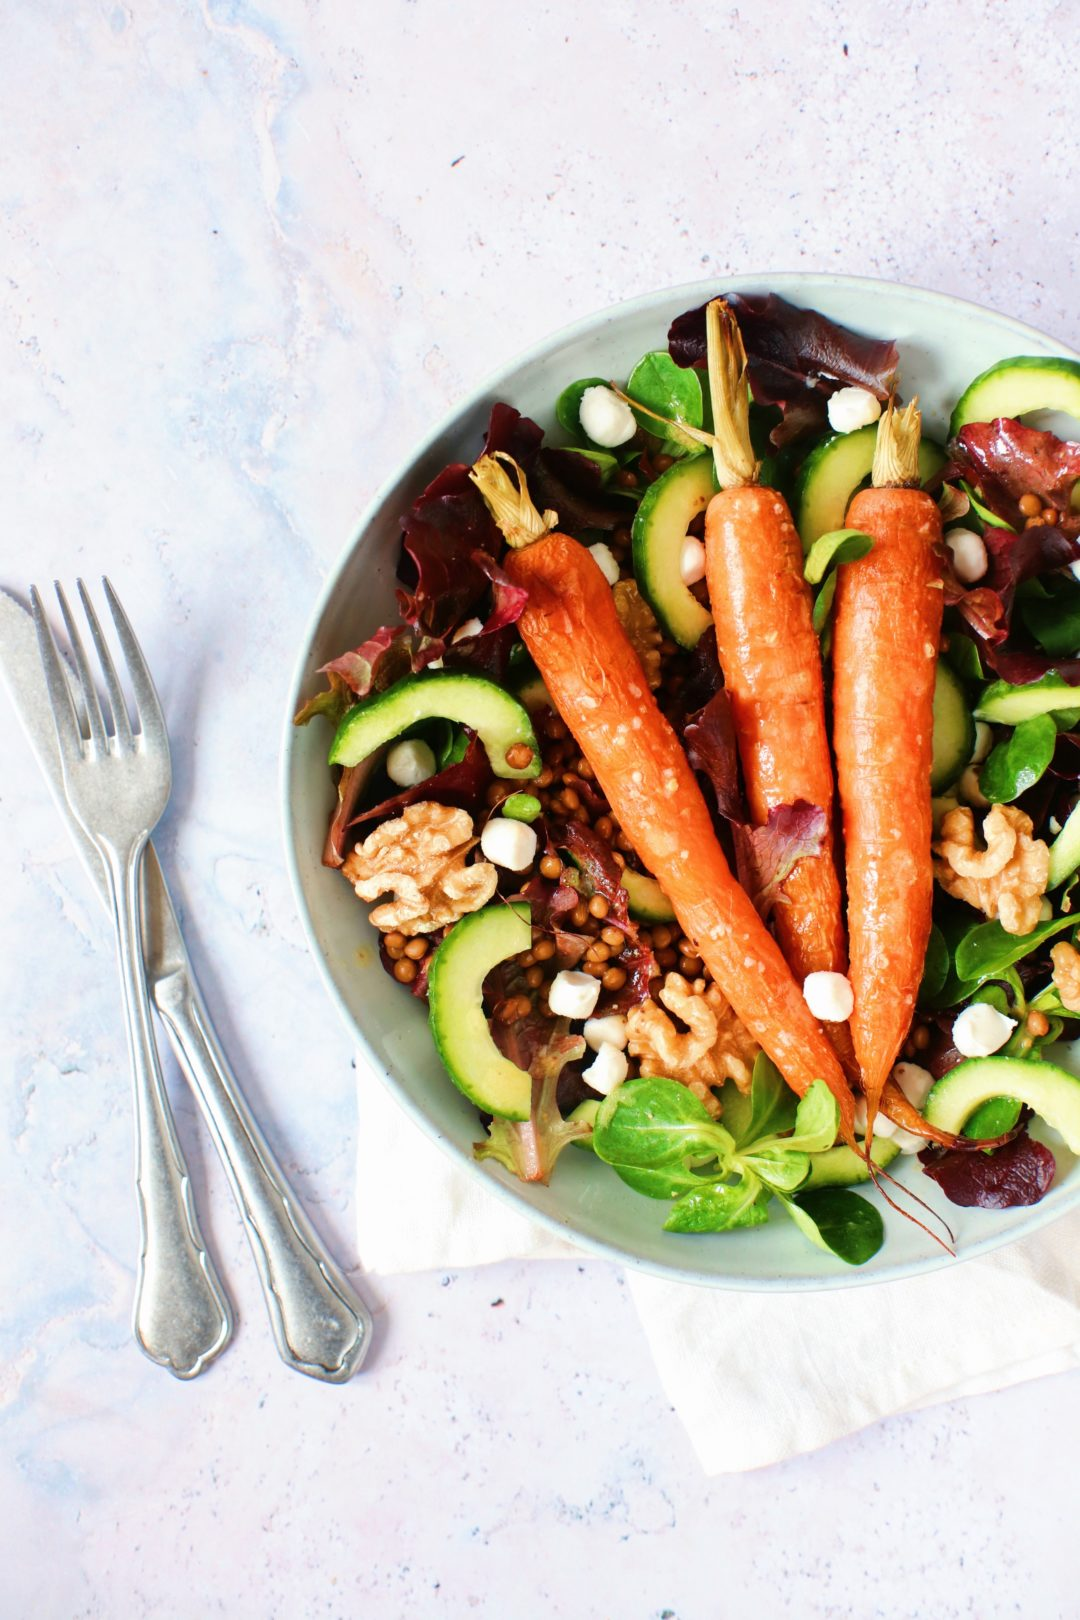 Recept salade linzen en geroosterde wortel www.jaimyskitchen.nl